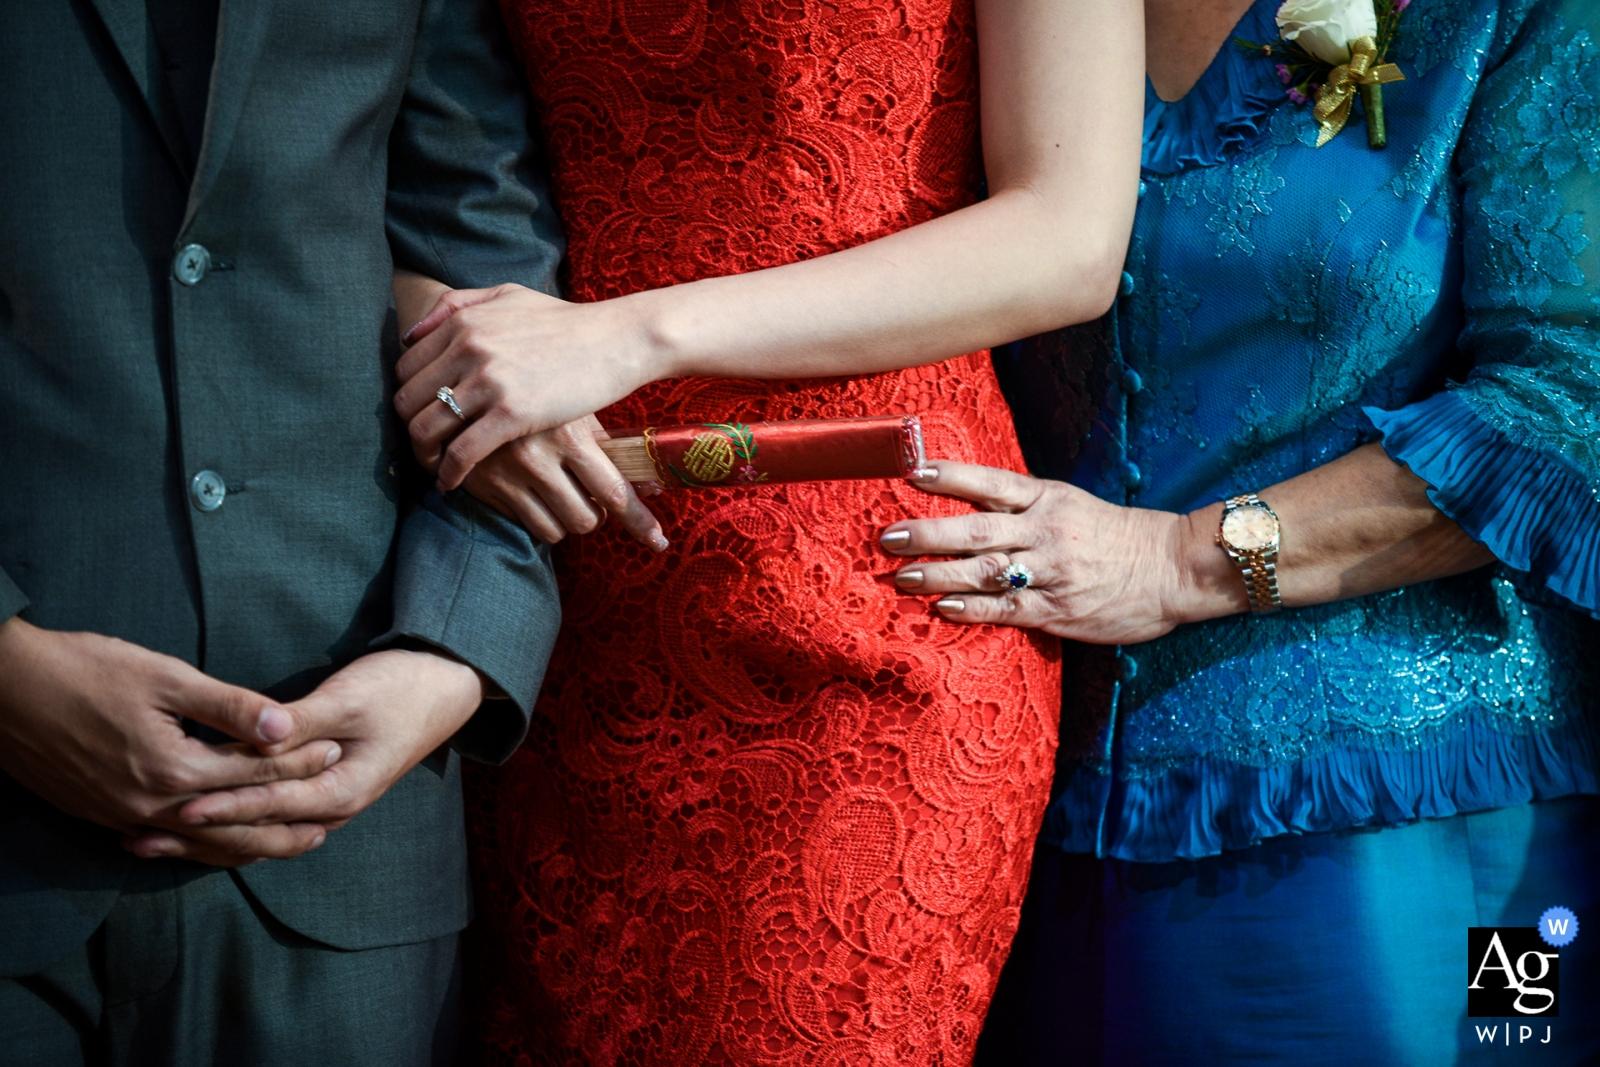 Bangkok creative wedding photography | detail of hands, arms and waists